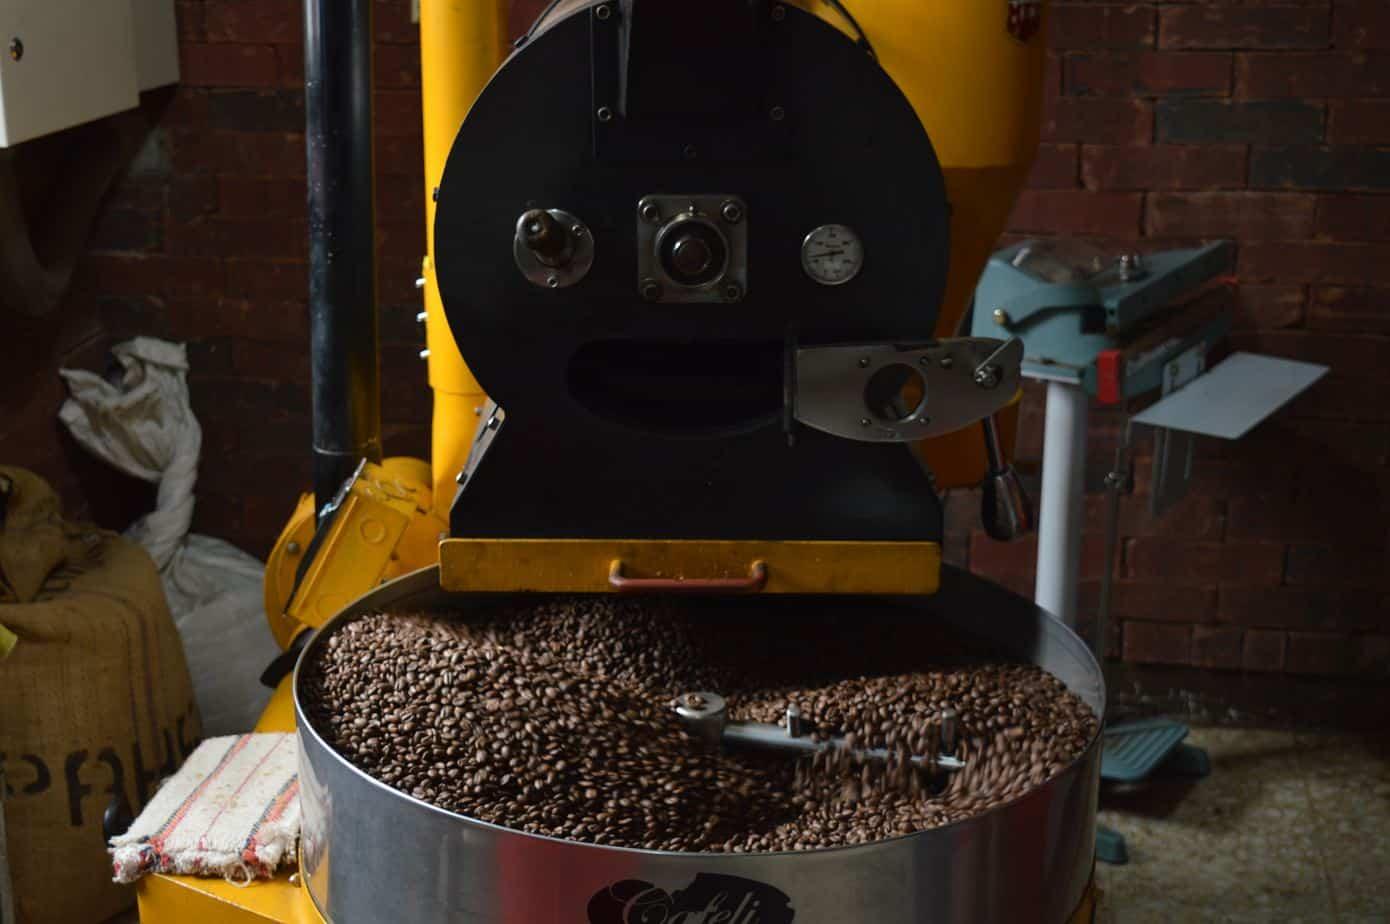 A Coffee Roaster Roasting Coffee Beans